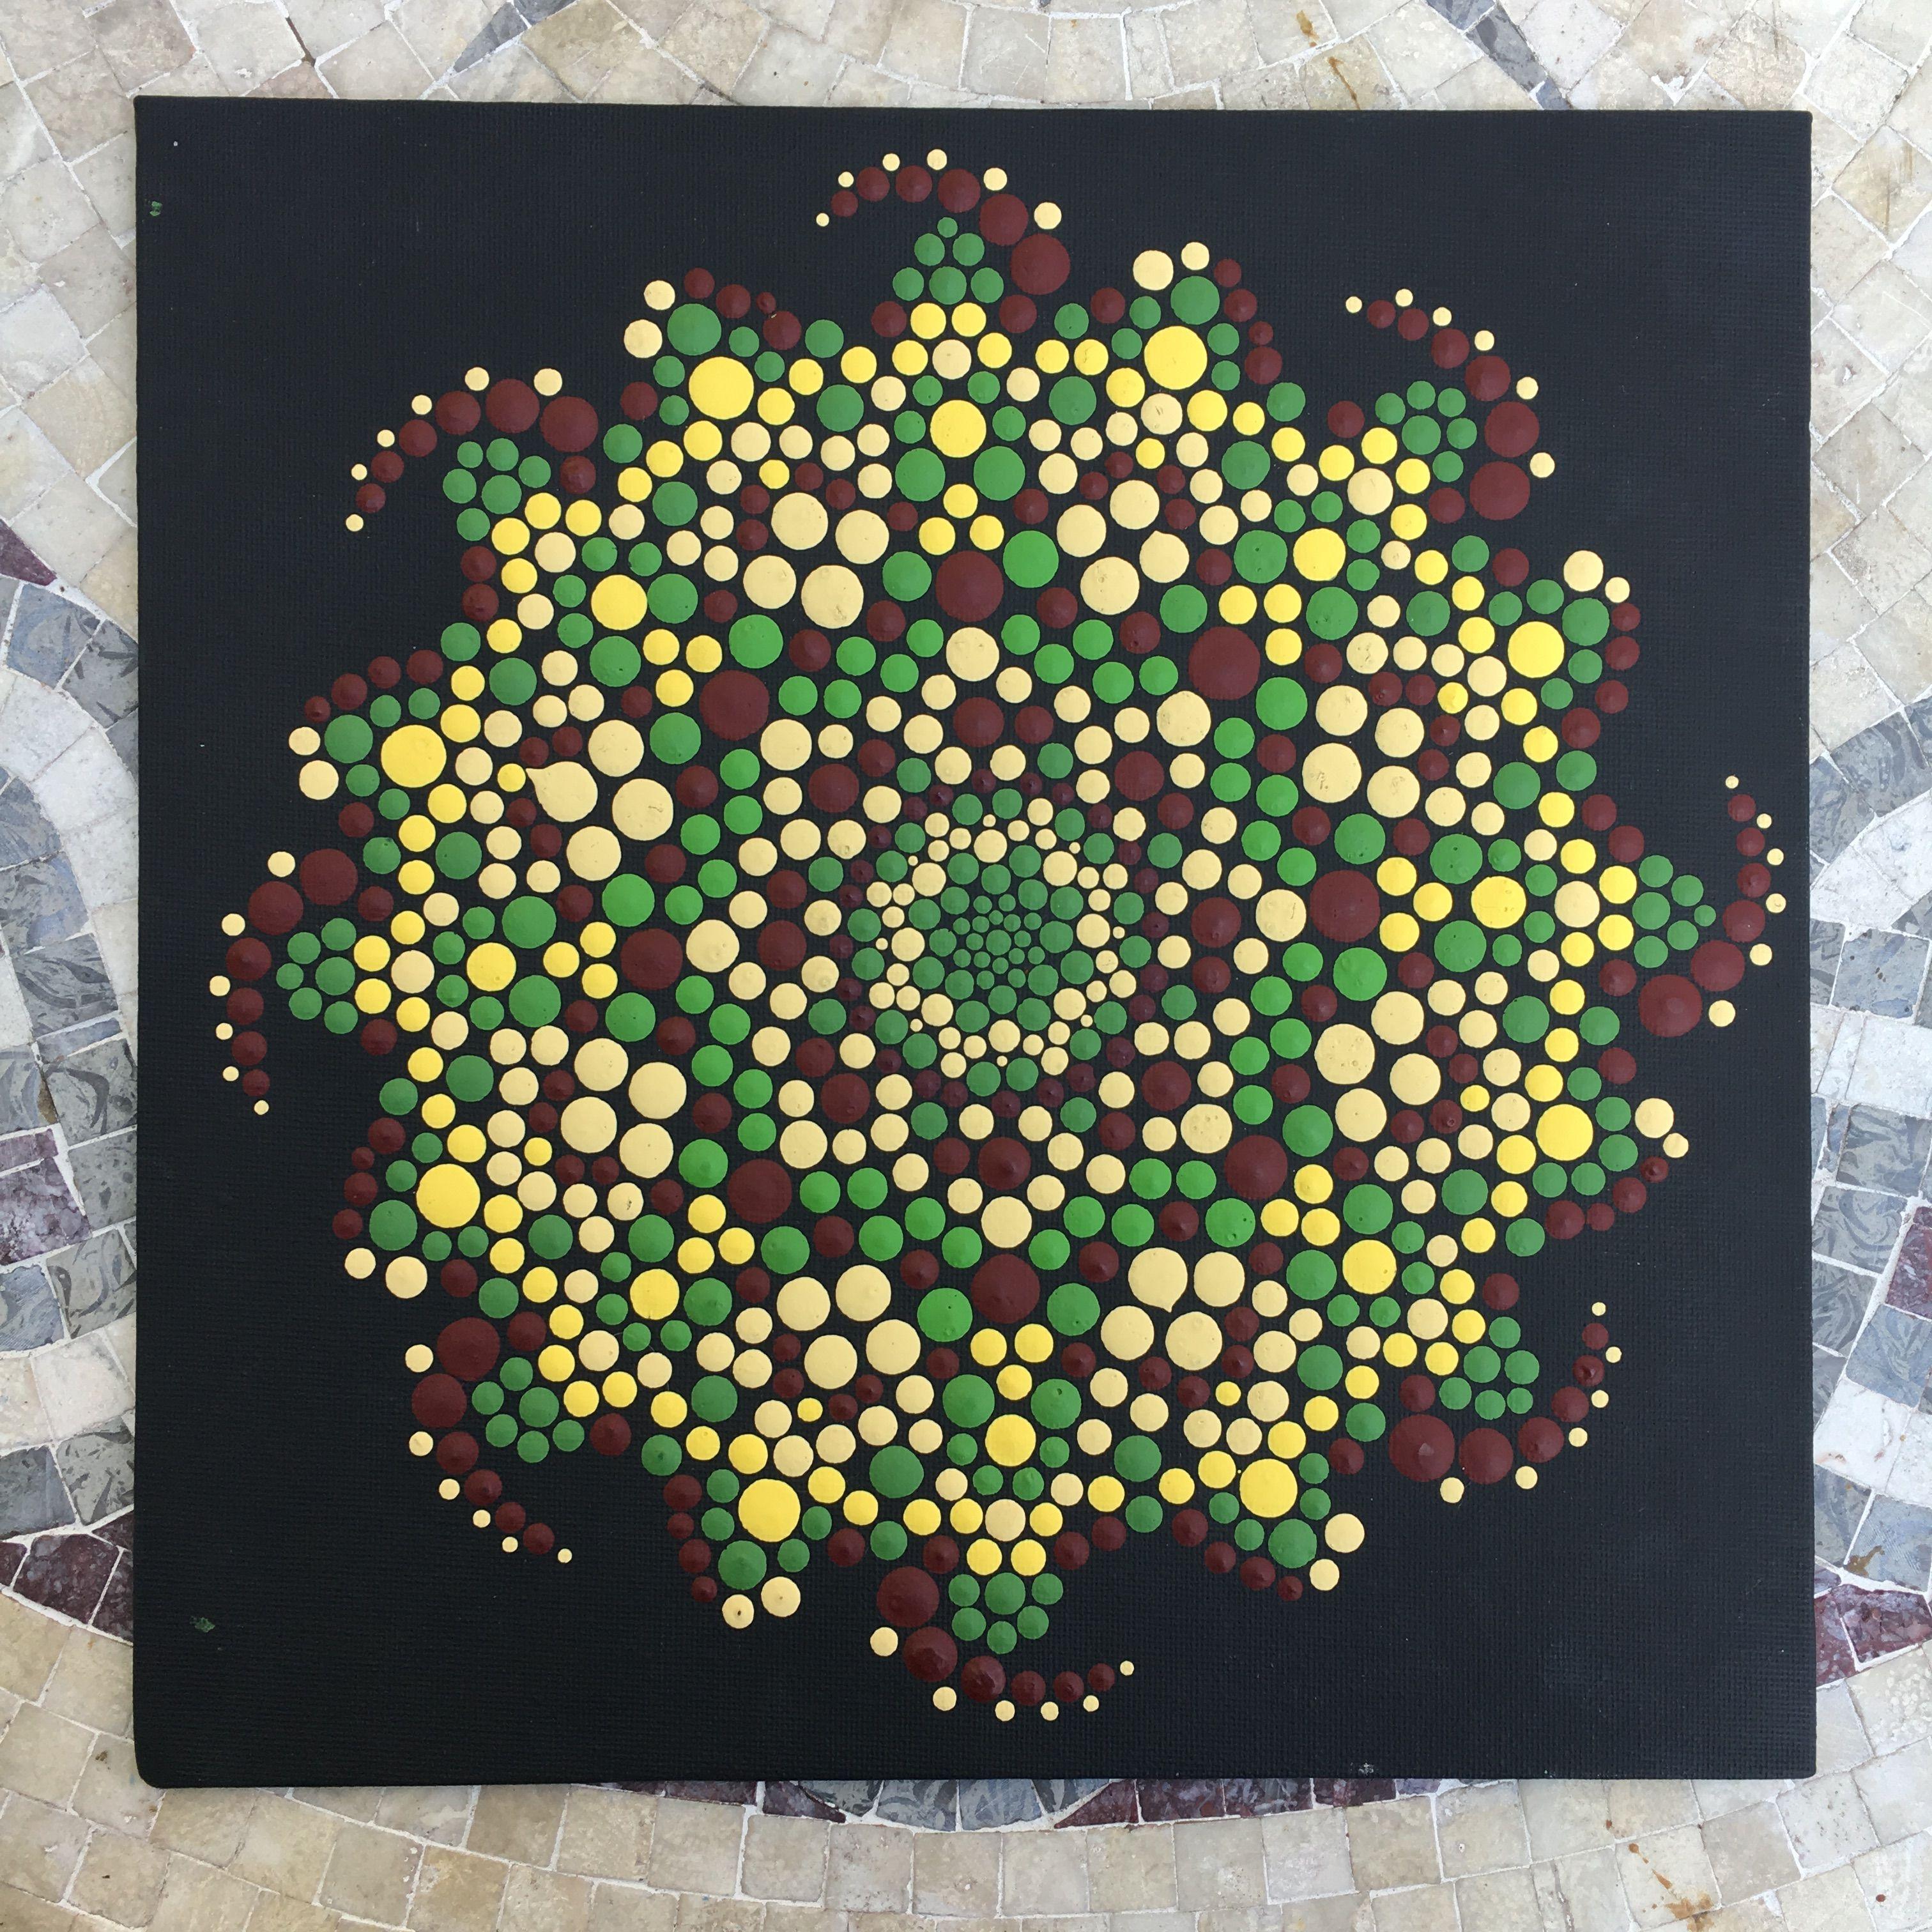 10X10 Canvas Panel W Free Display Frame Mandala Dot Art